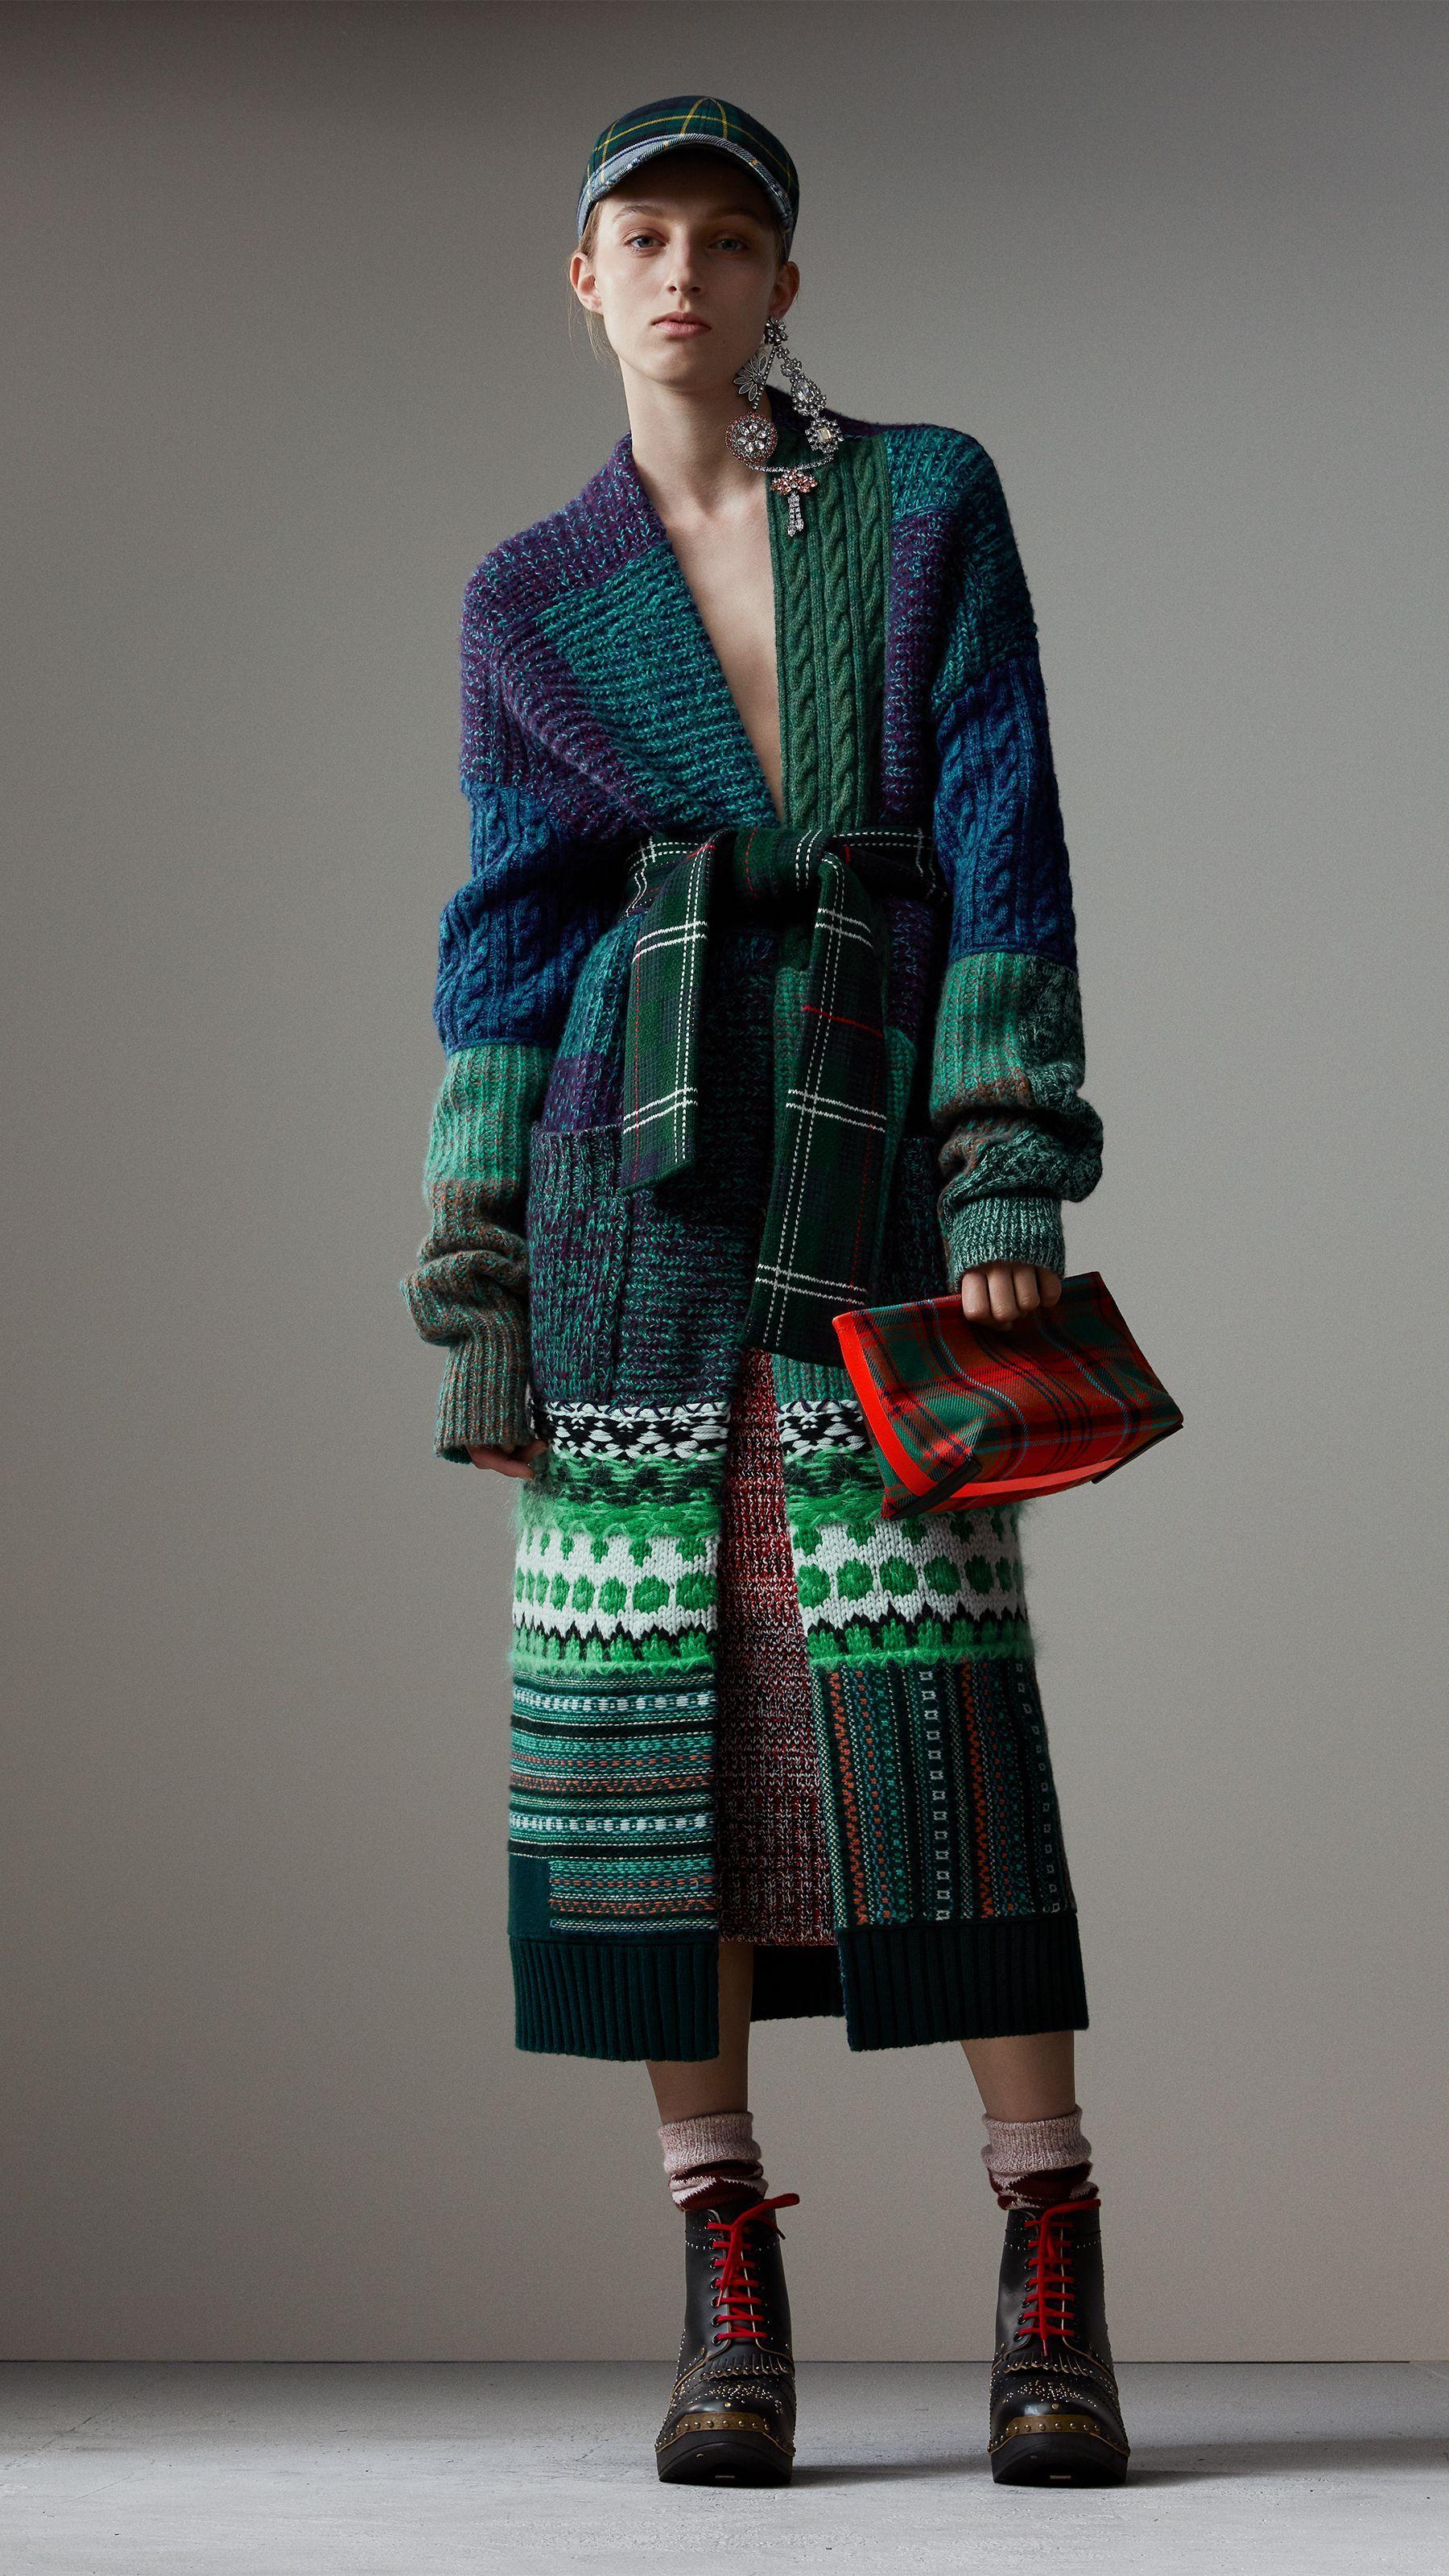 Cashmere Wool Mohair Patchwork Cardigan Coat in Hydrangea Blue - Women   Burberry #knitting #knit #coat #fairisle #plaid #colorblock